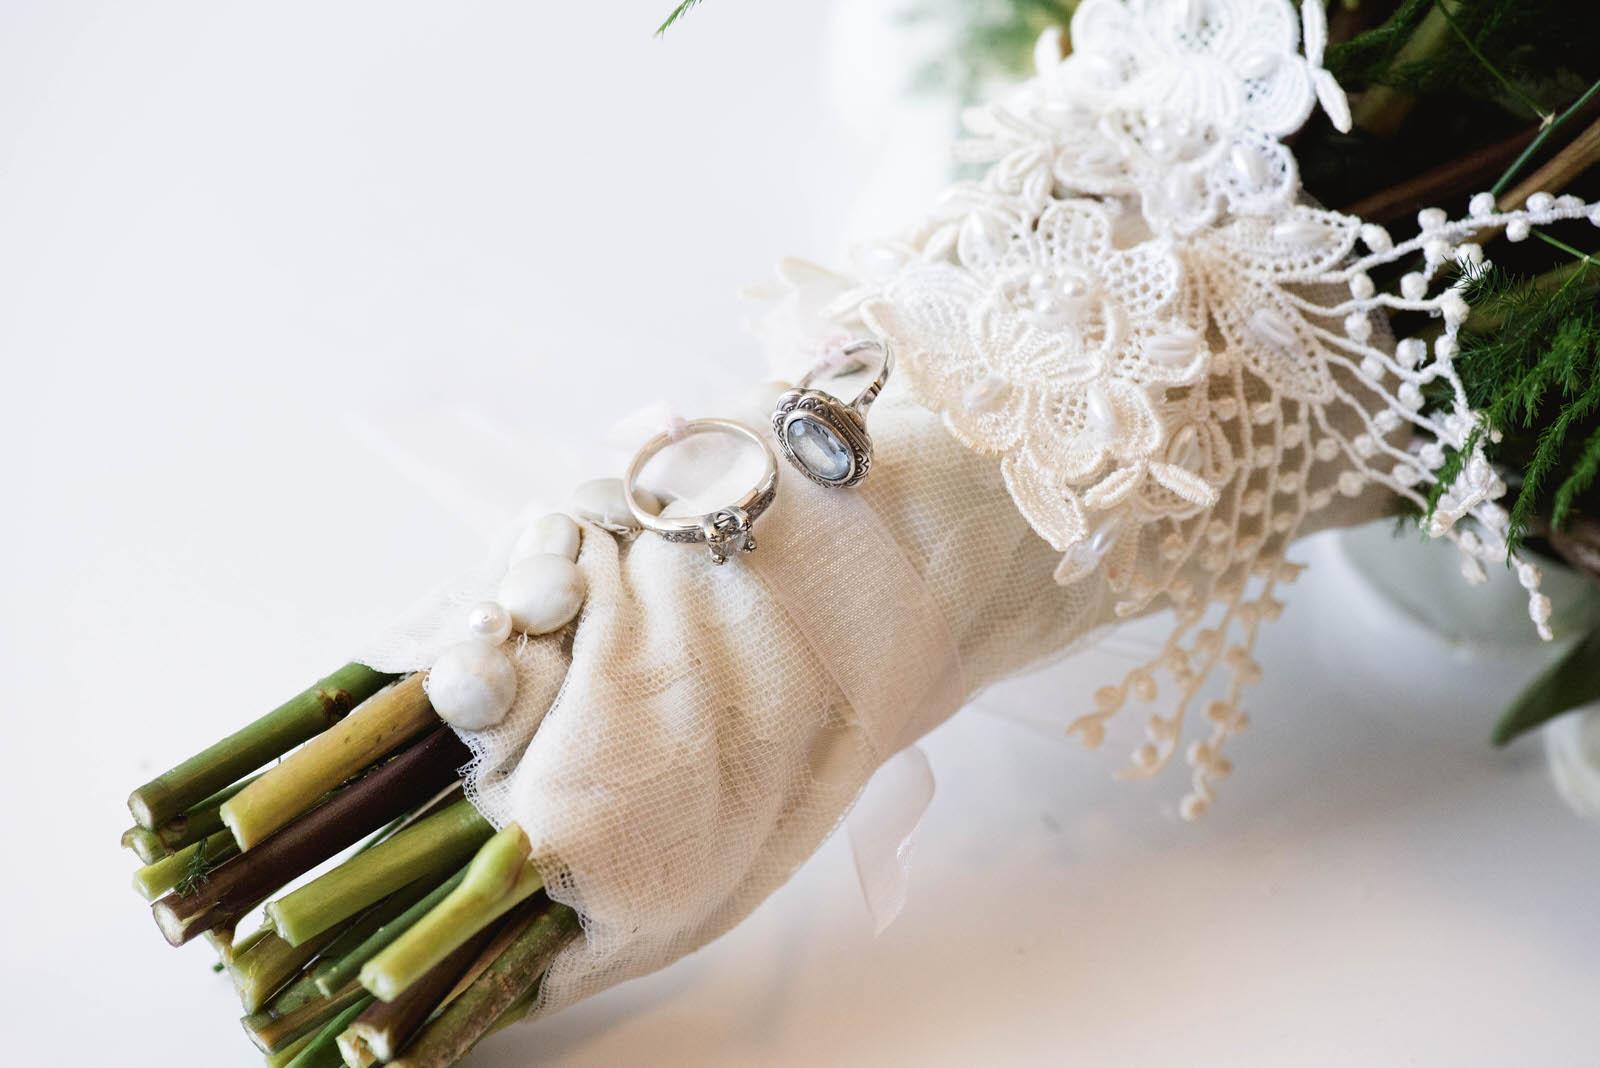 weddings-at-Holy-Cross-Greek-Orthodox-Church-and-Hall-29.jpg